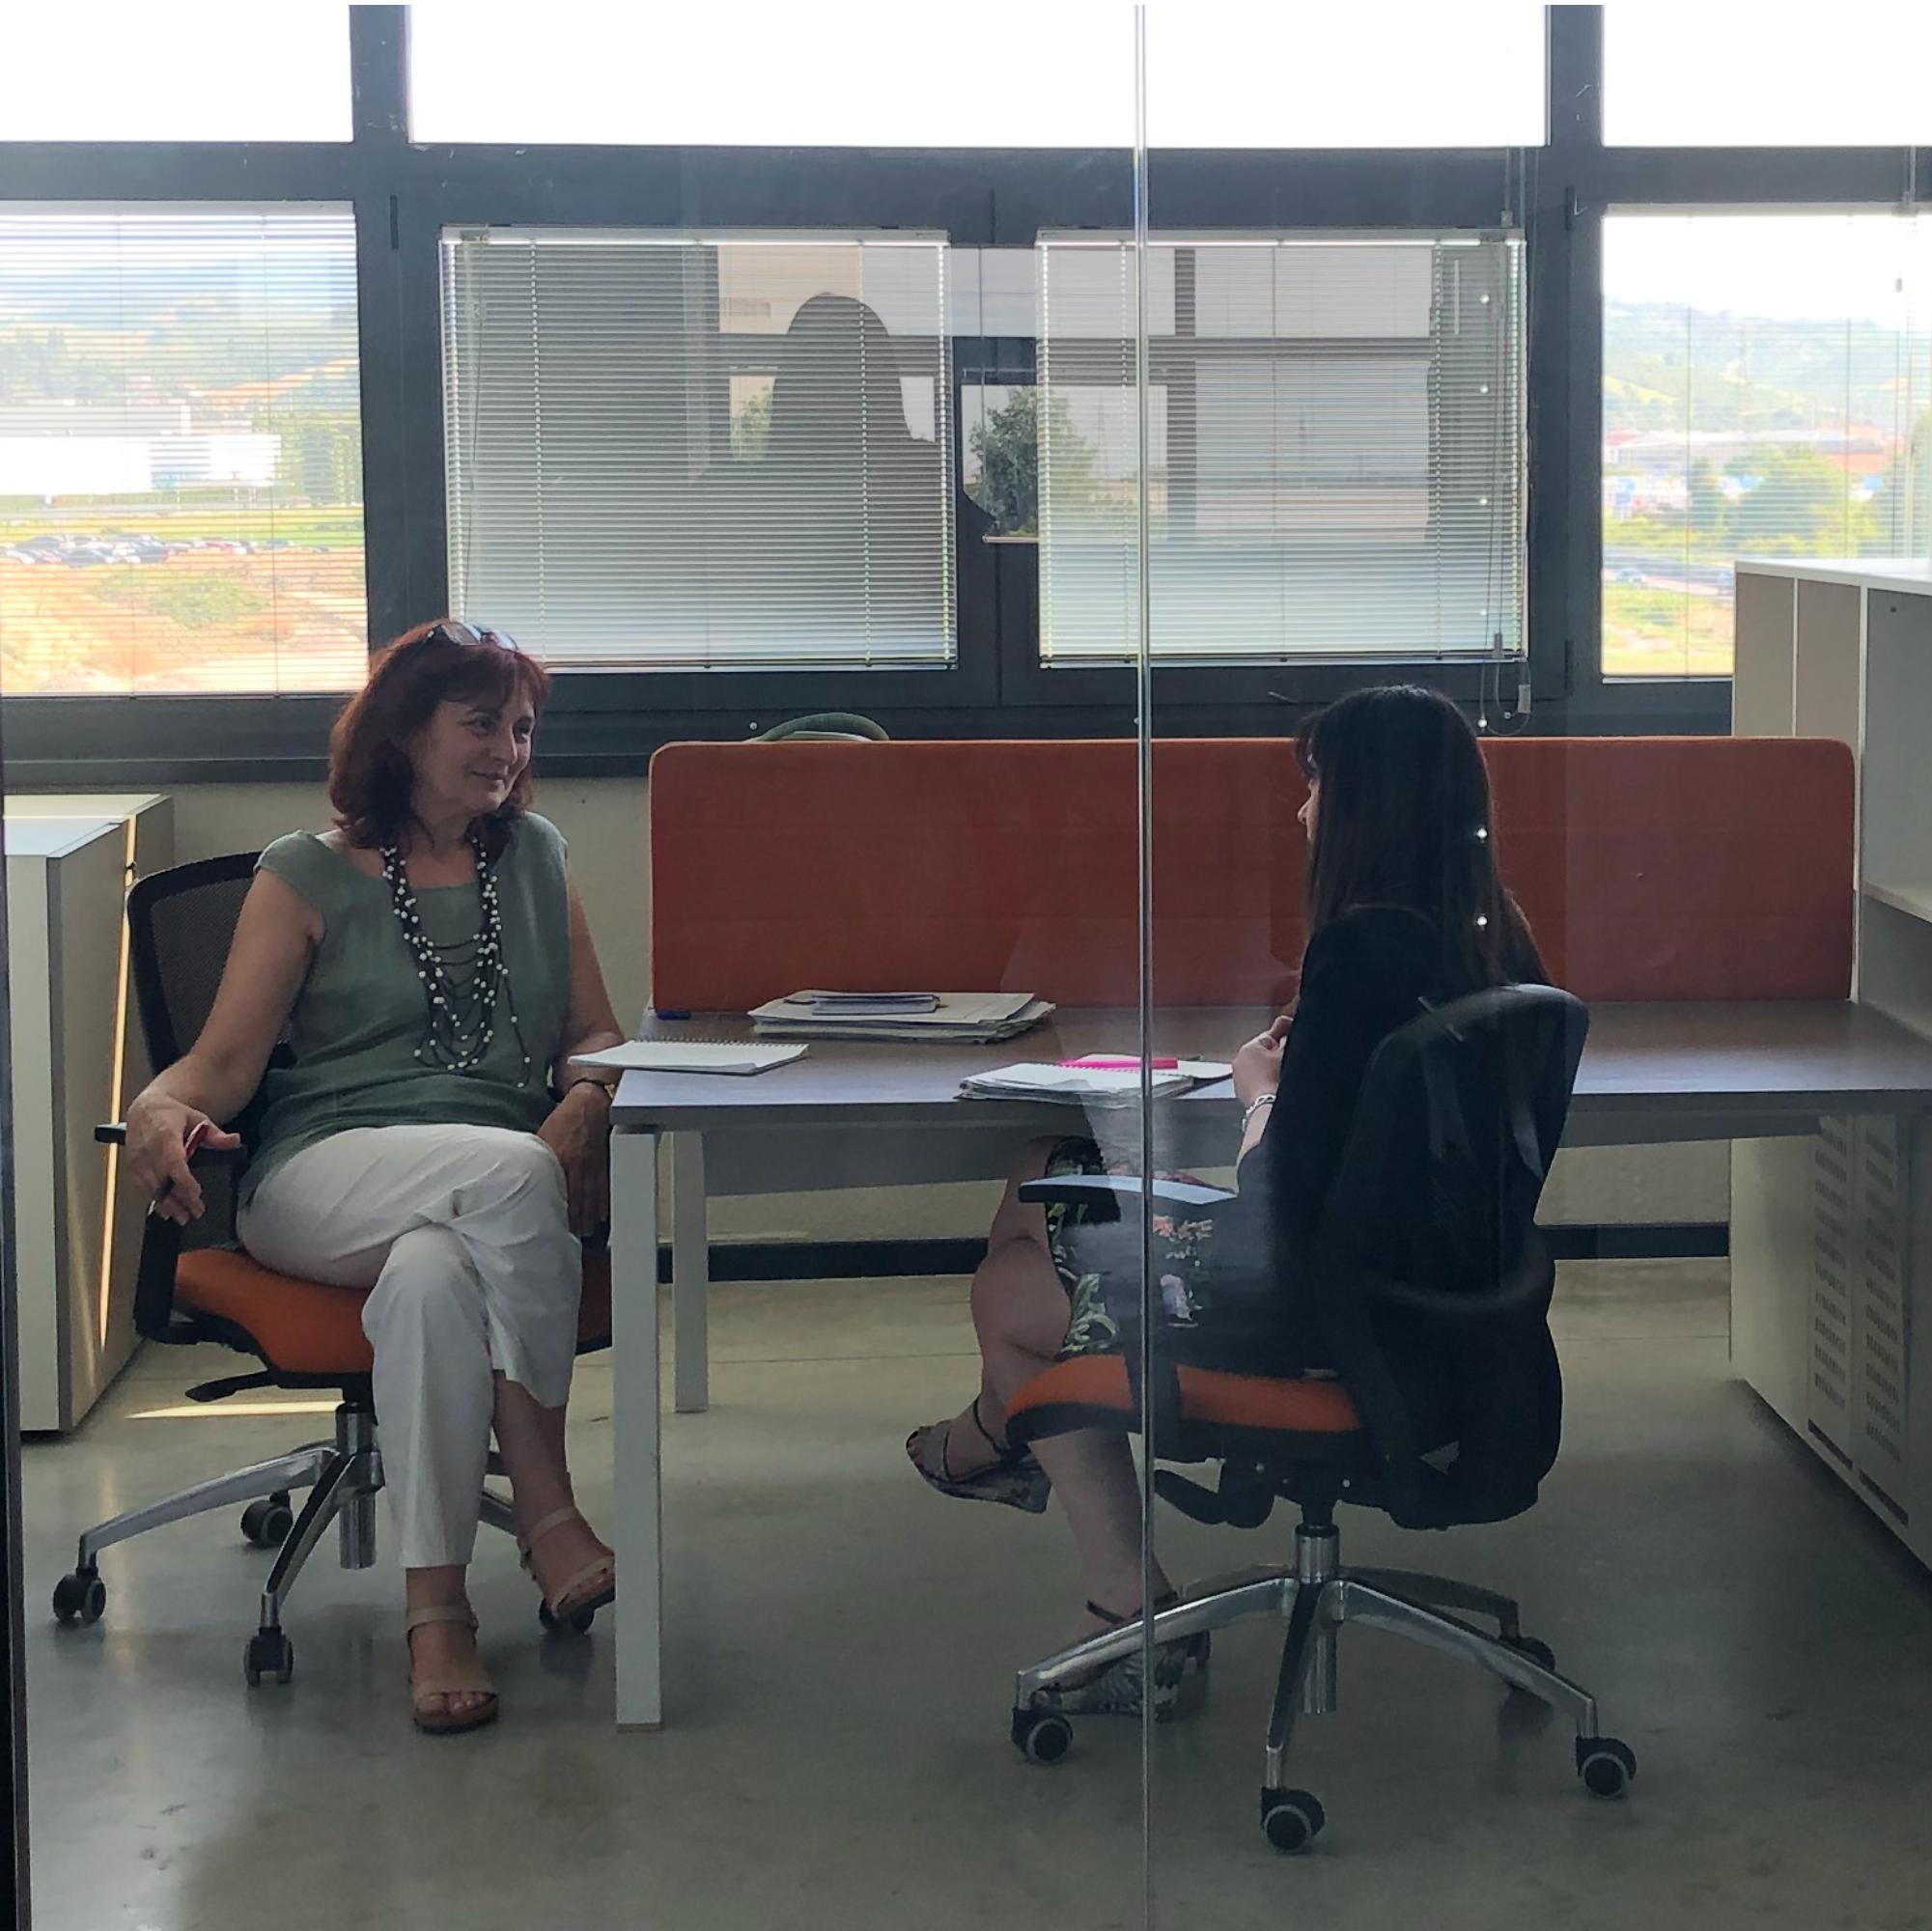 Sessione di mentoring